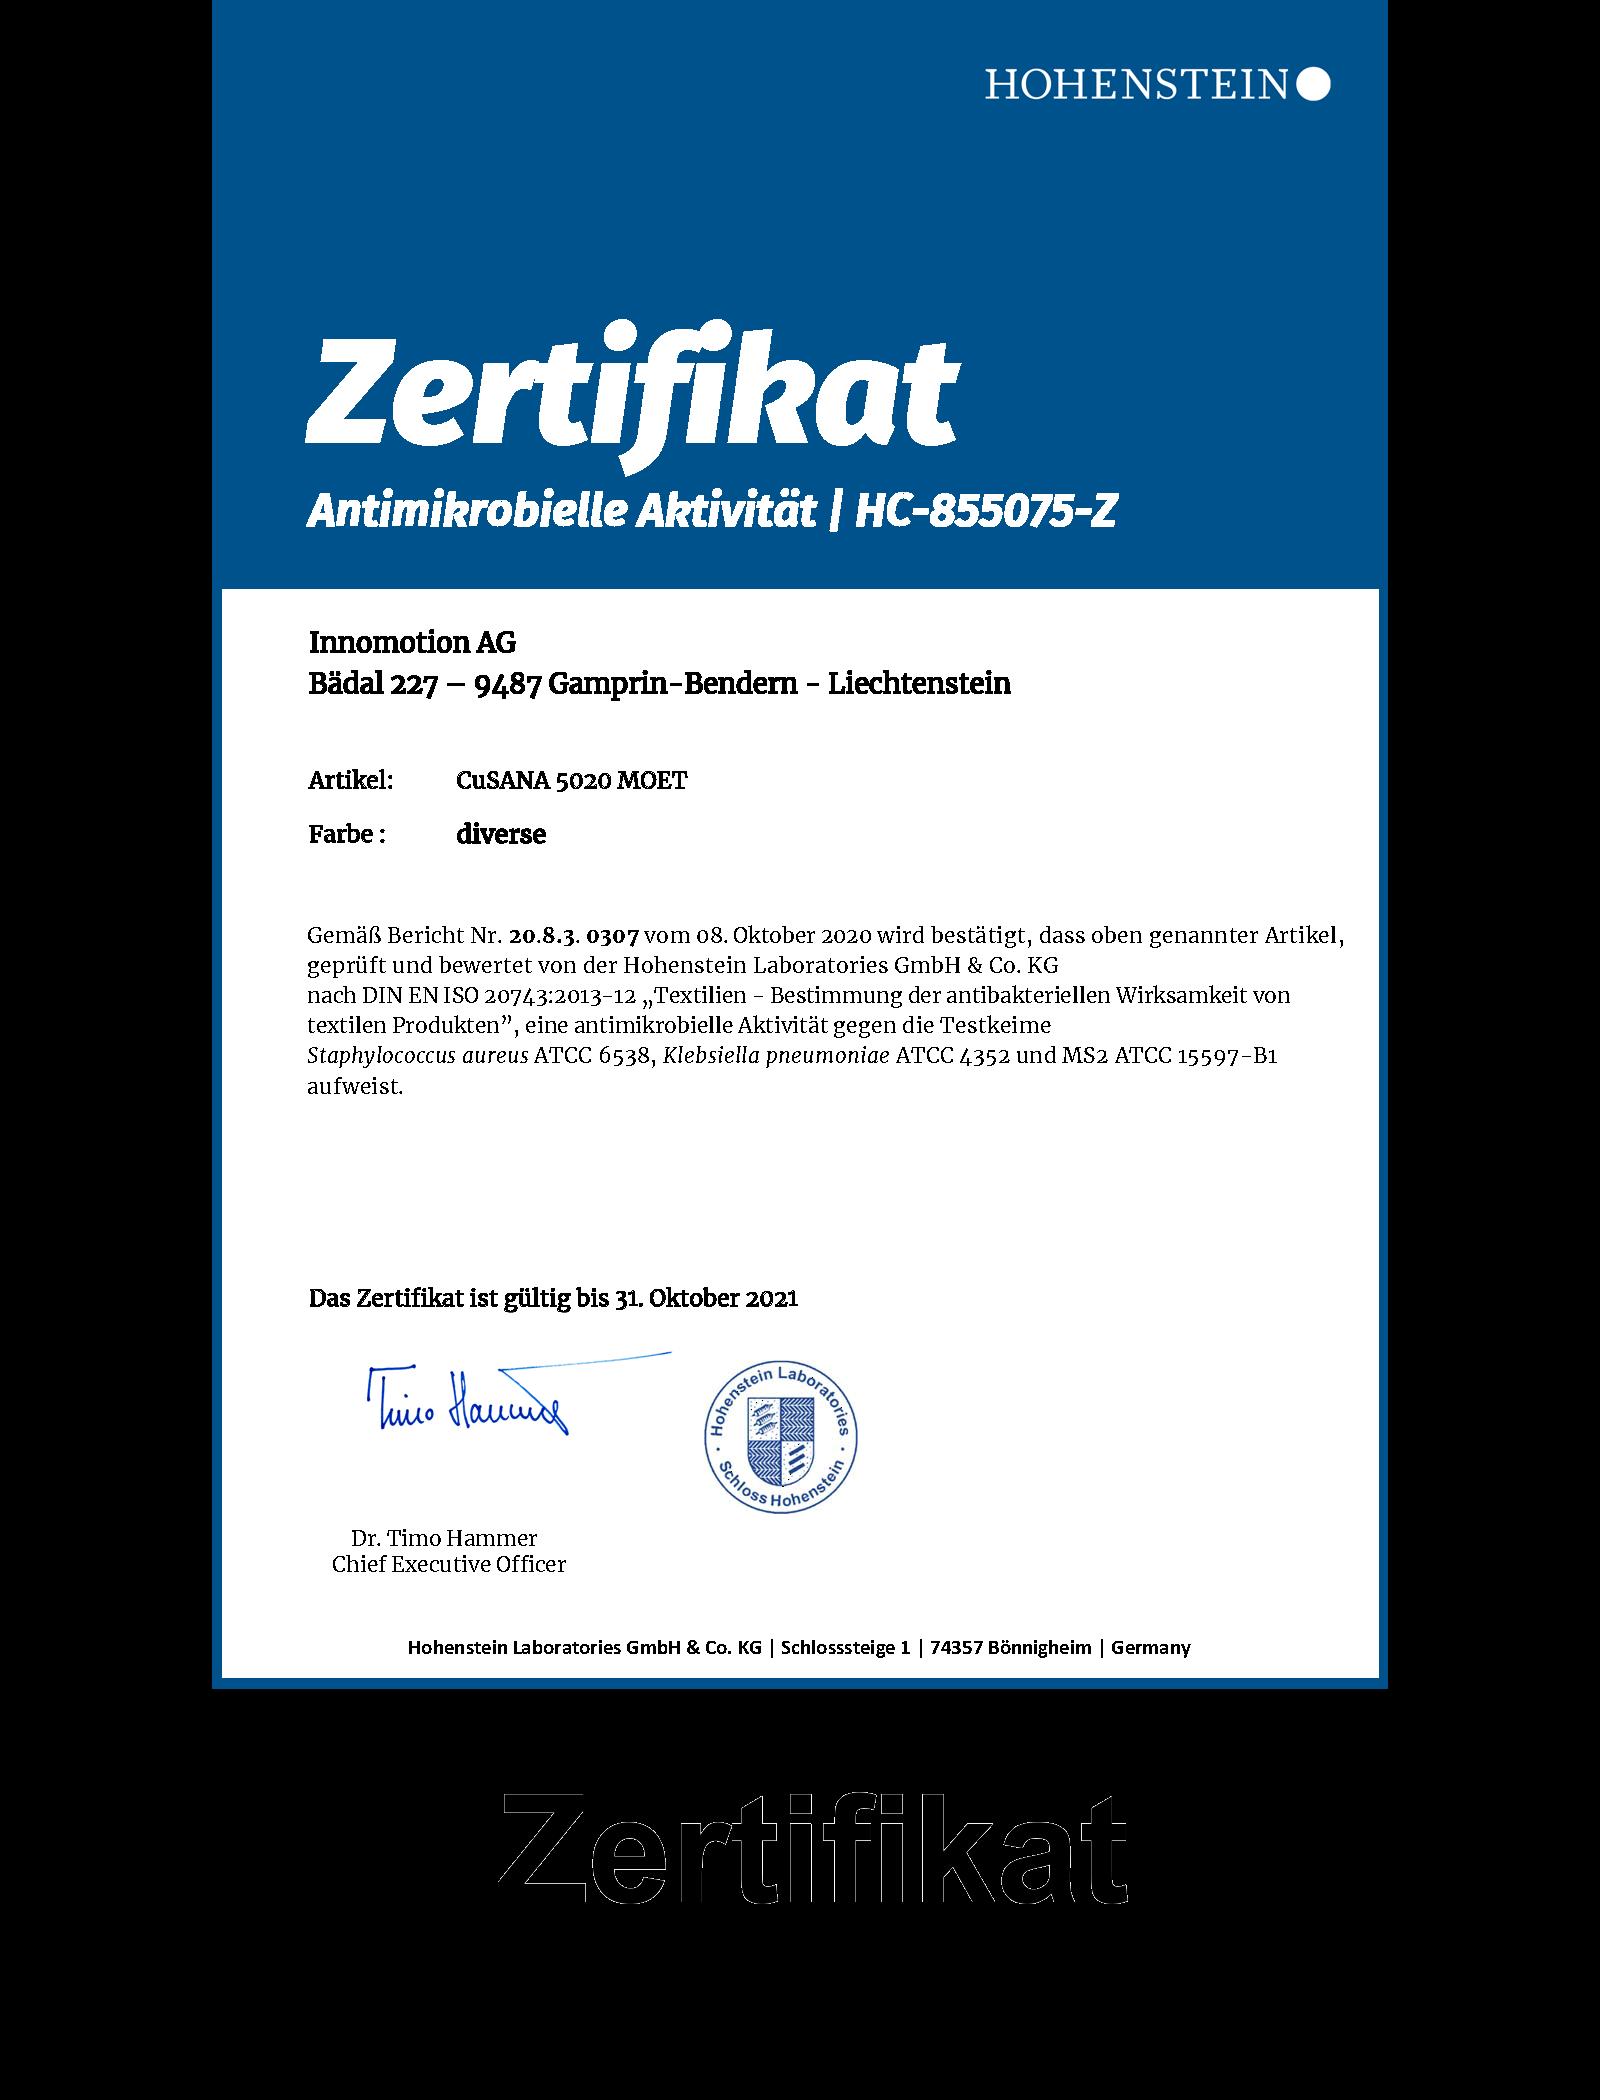 HC-855075-Zertifikat-Antimikrobiell